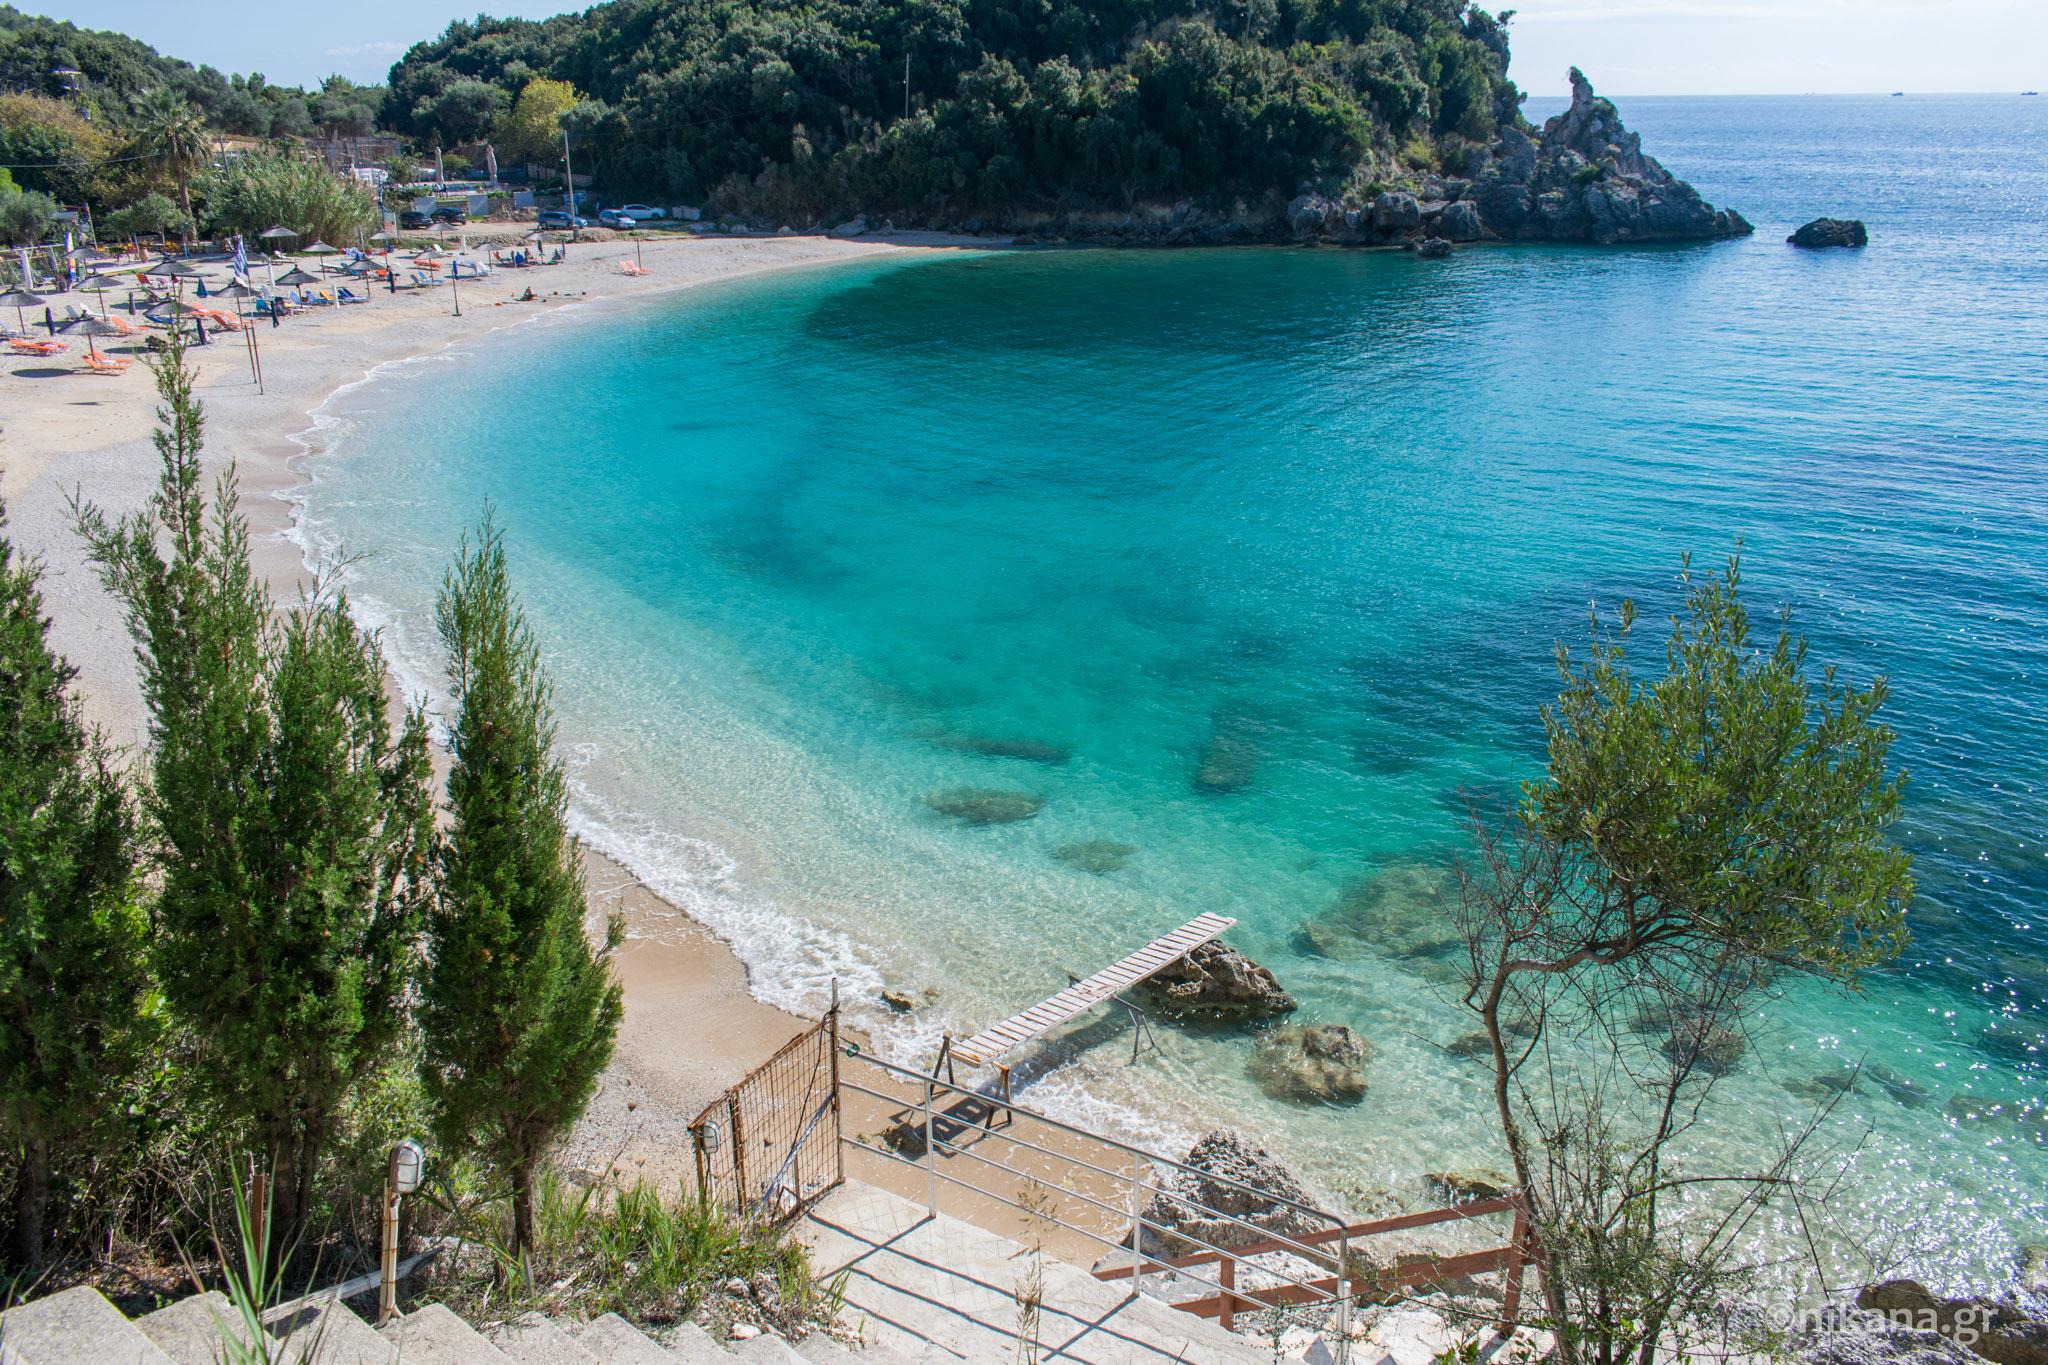 Sarakiniko Beach Epirus Tourist Guide Nikana Gr